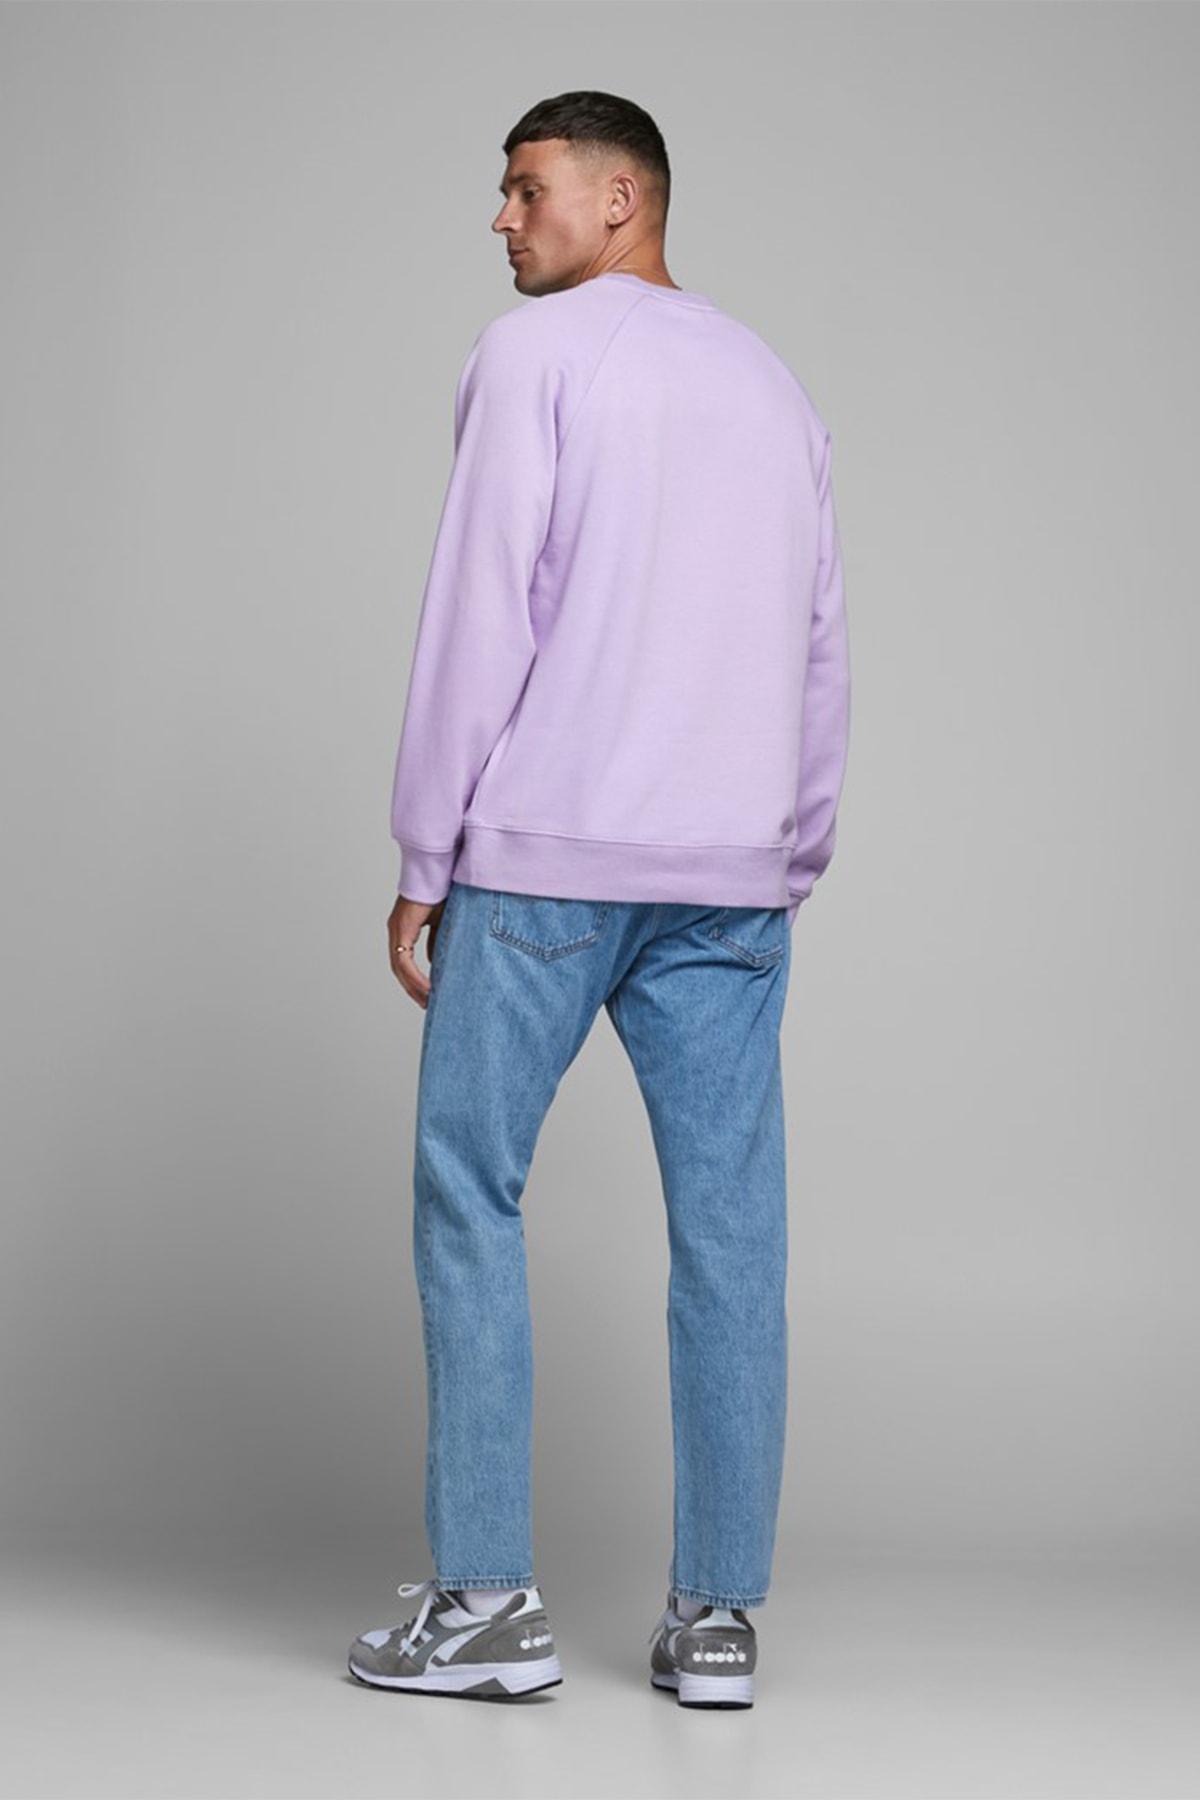 Jack & Jones Erkek Lavanta Crew Neck Sweatshirt 12180365 2